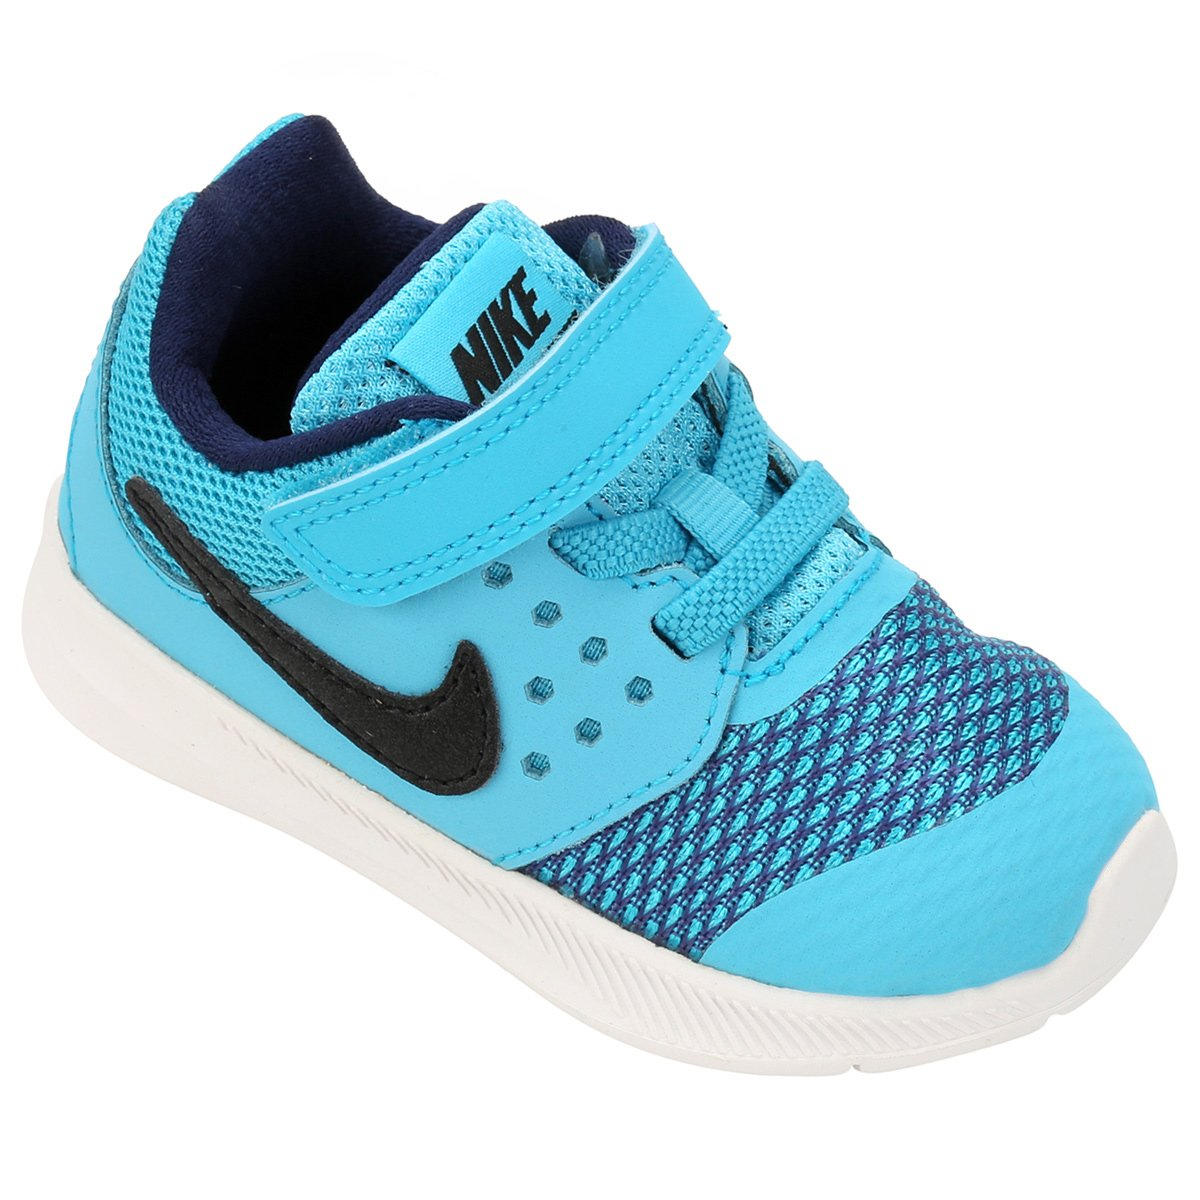 bc83c6424d6e2 Tênis Infantil Nike Downshifter 7 - Compre Agora